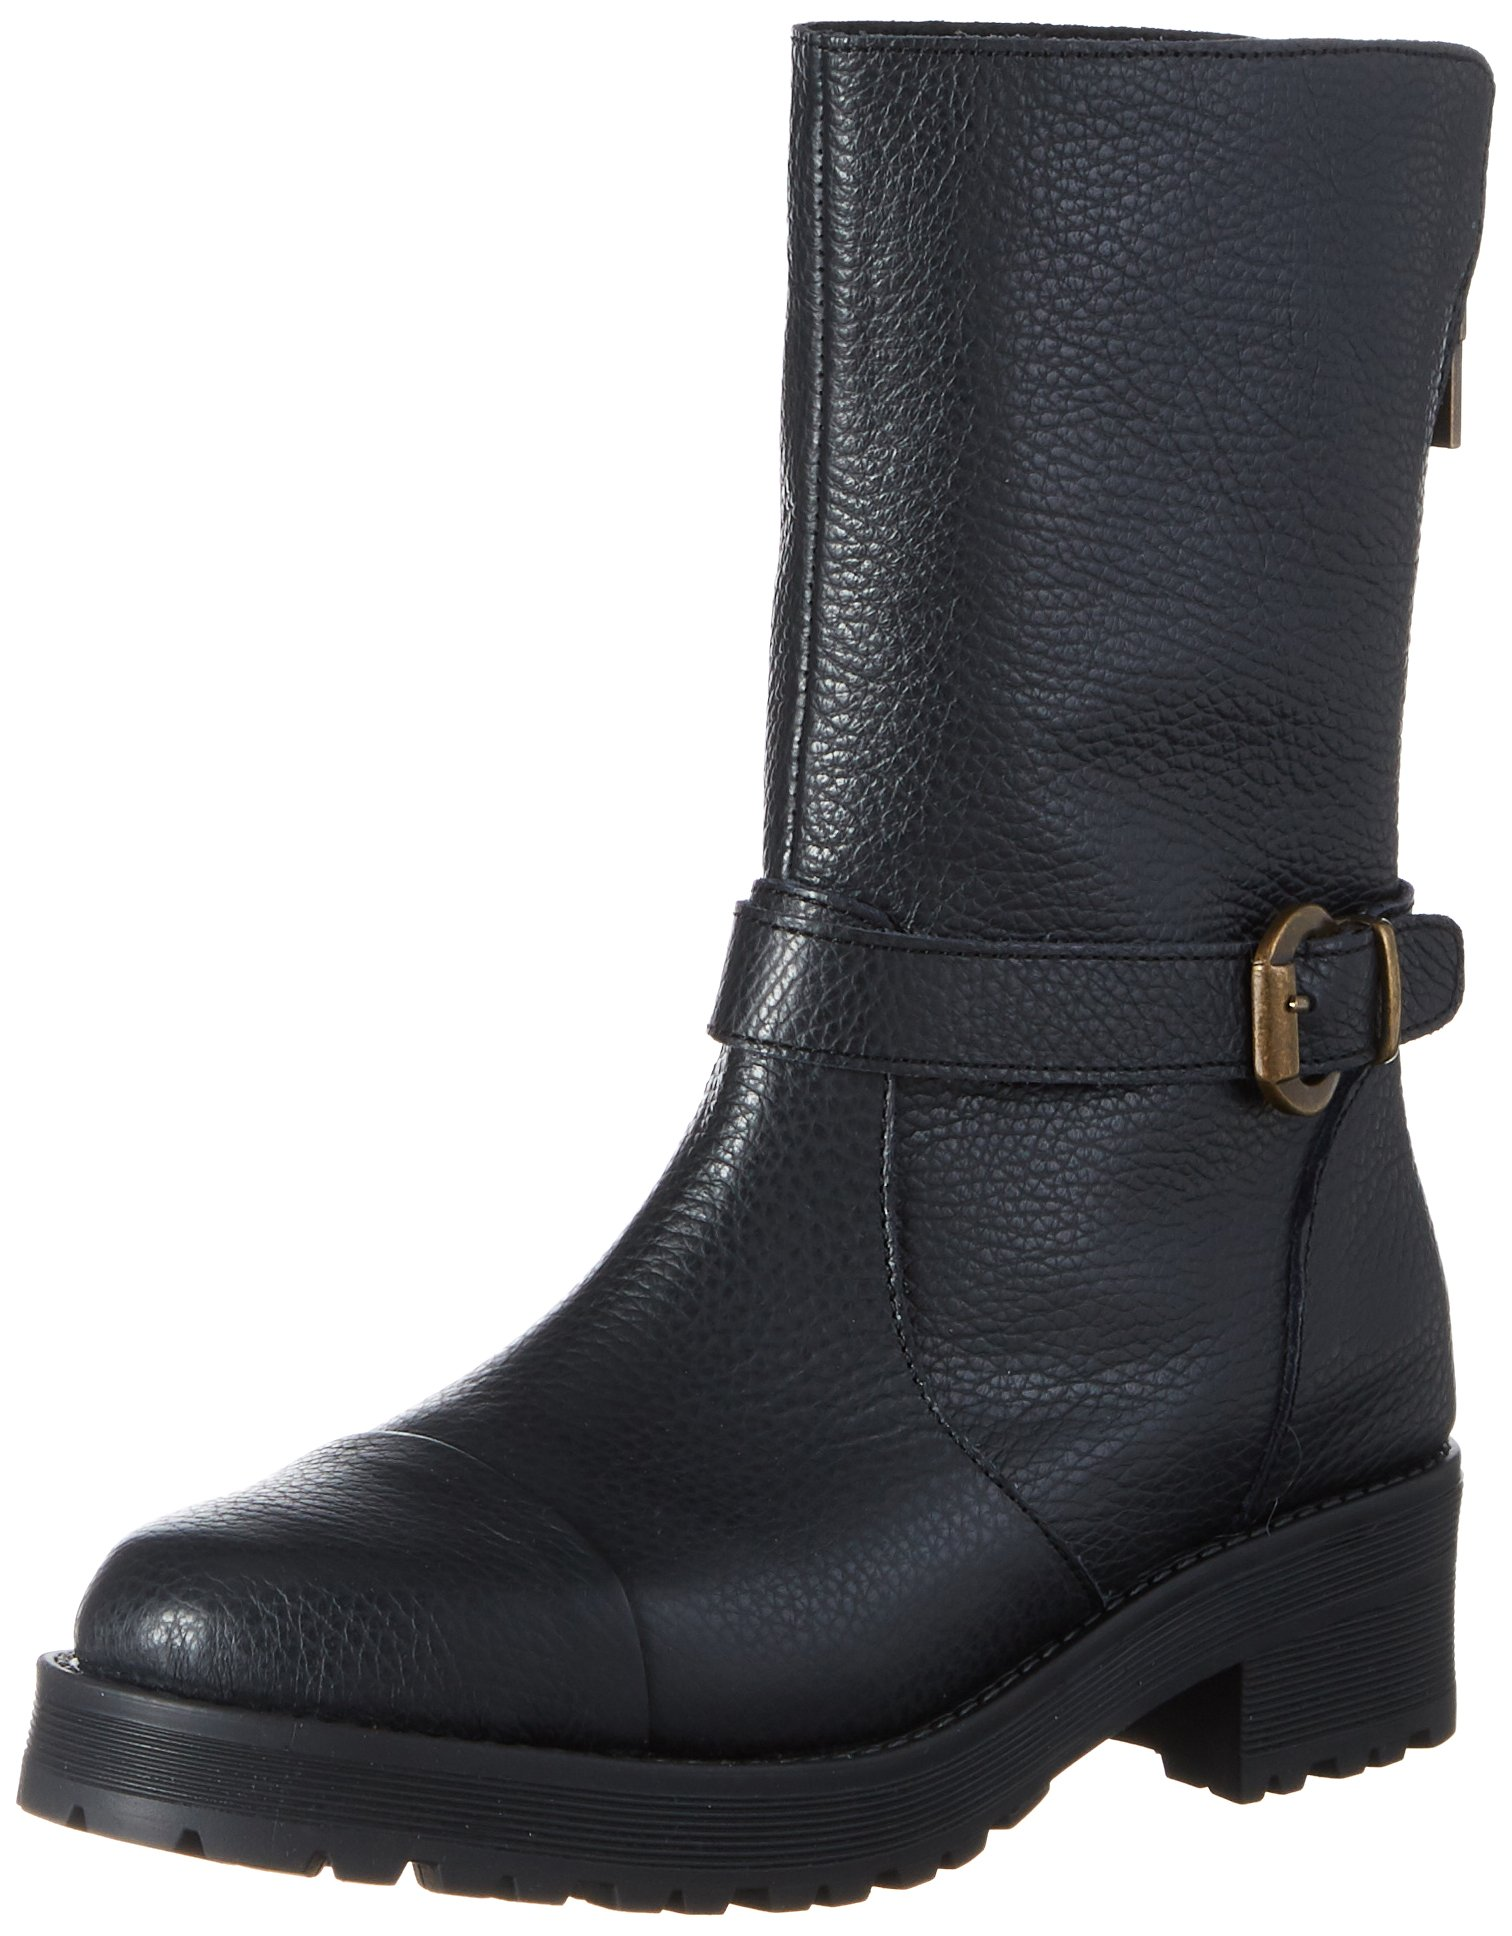 Shoe Eu Black39 Bear Kitty SBottes FemmeNoir110 The fmY6yIgbv7